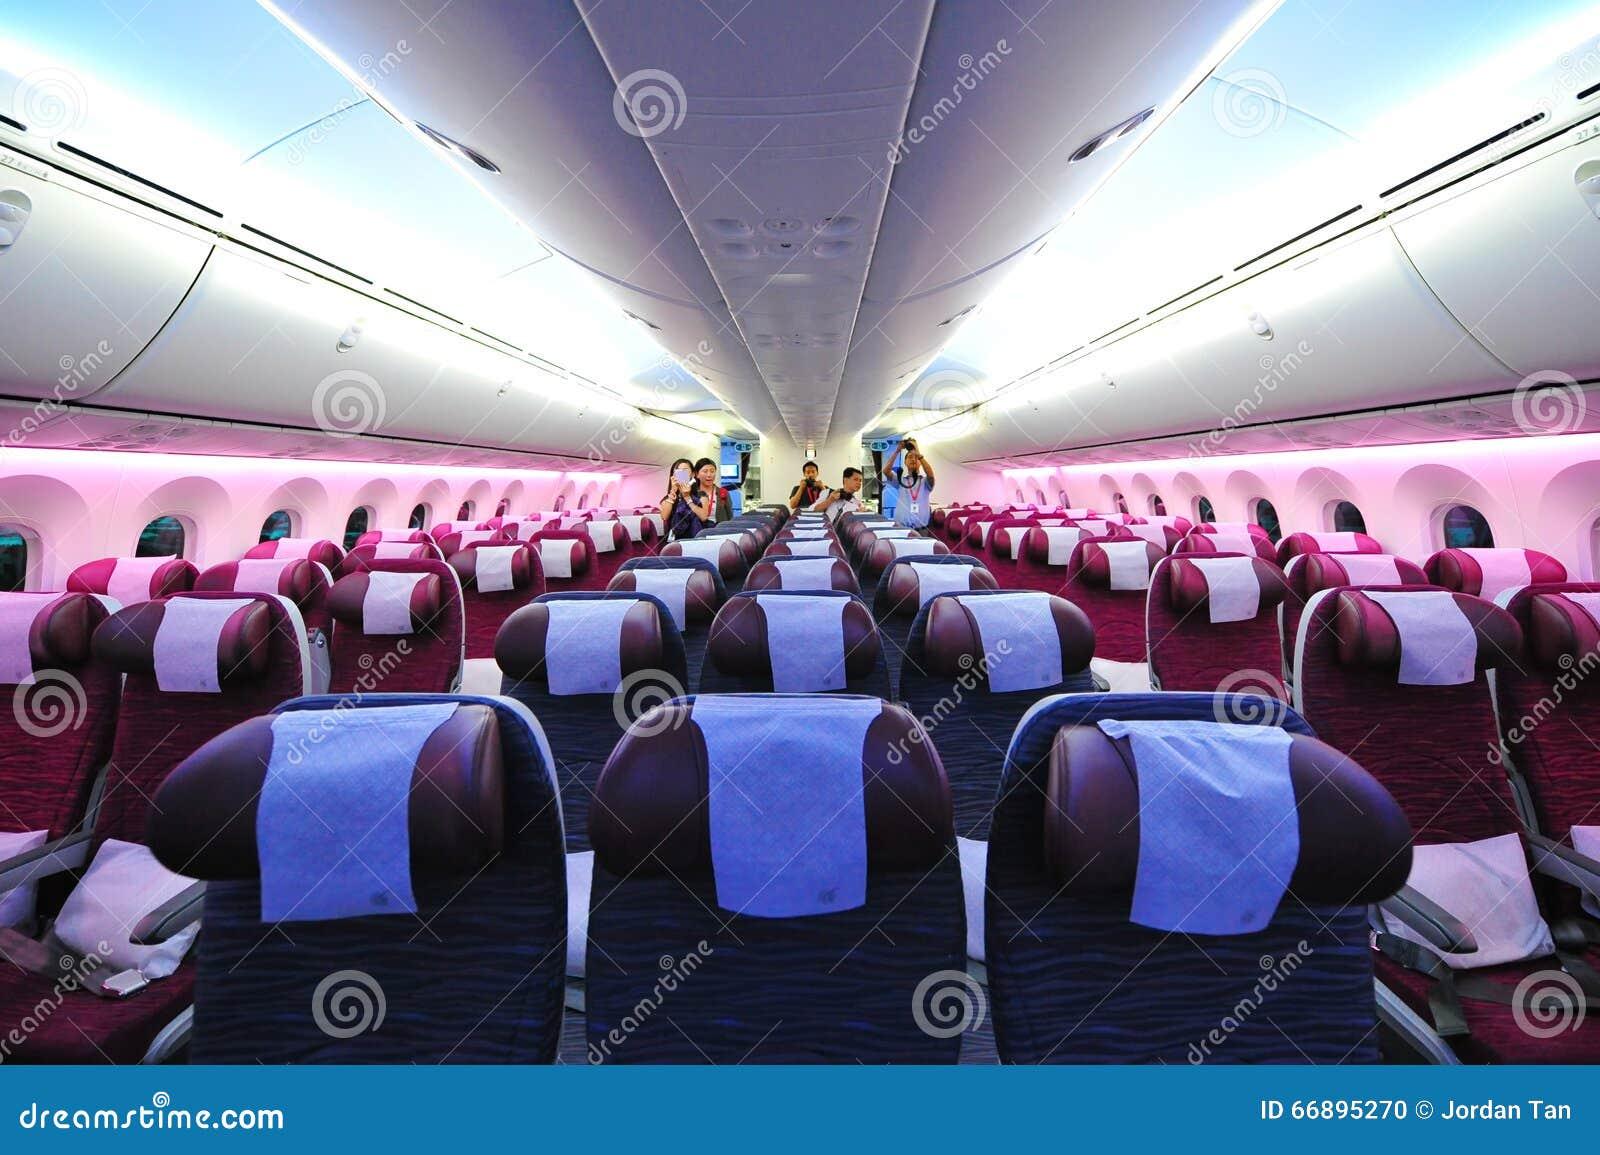 https://thumbs.dreamstime.com/z/spacious-comfortable-economy-class-cabin-qatar-airways-boeing-dreamliner-singapore-airshow-february-february-66895270.jpg